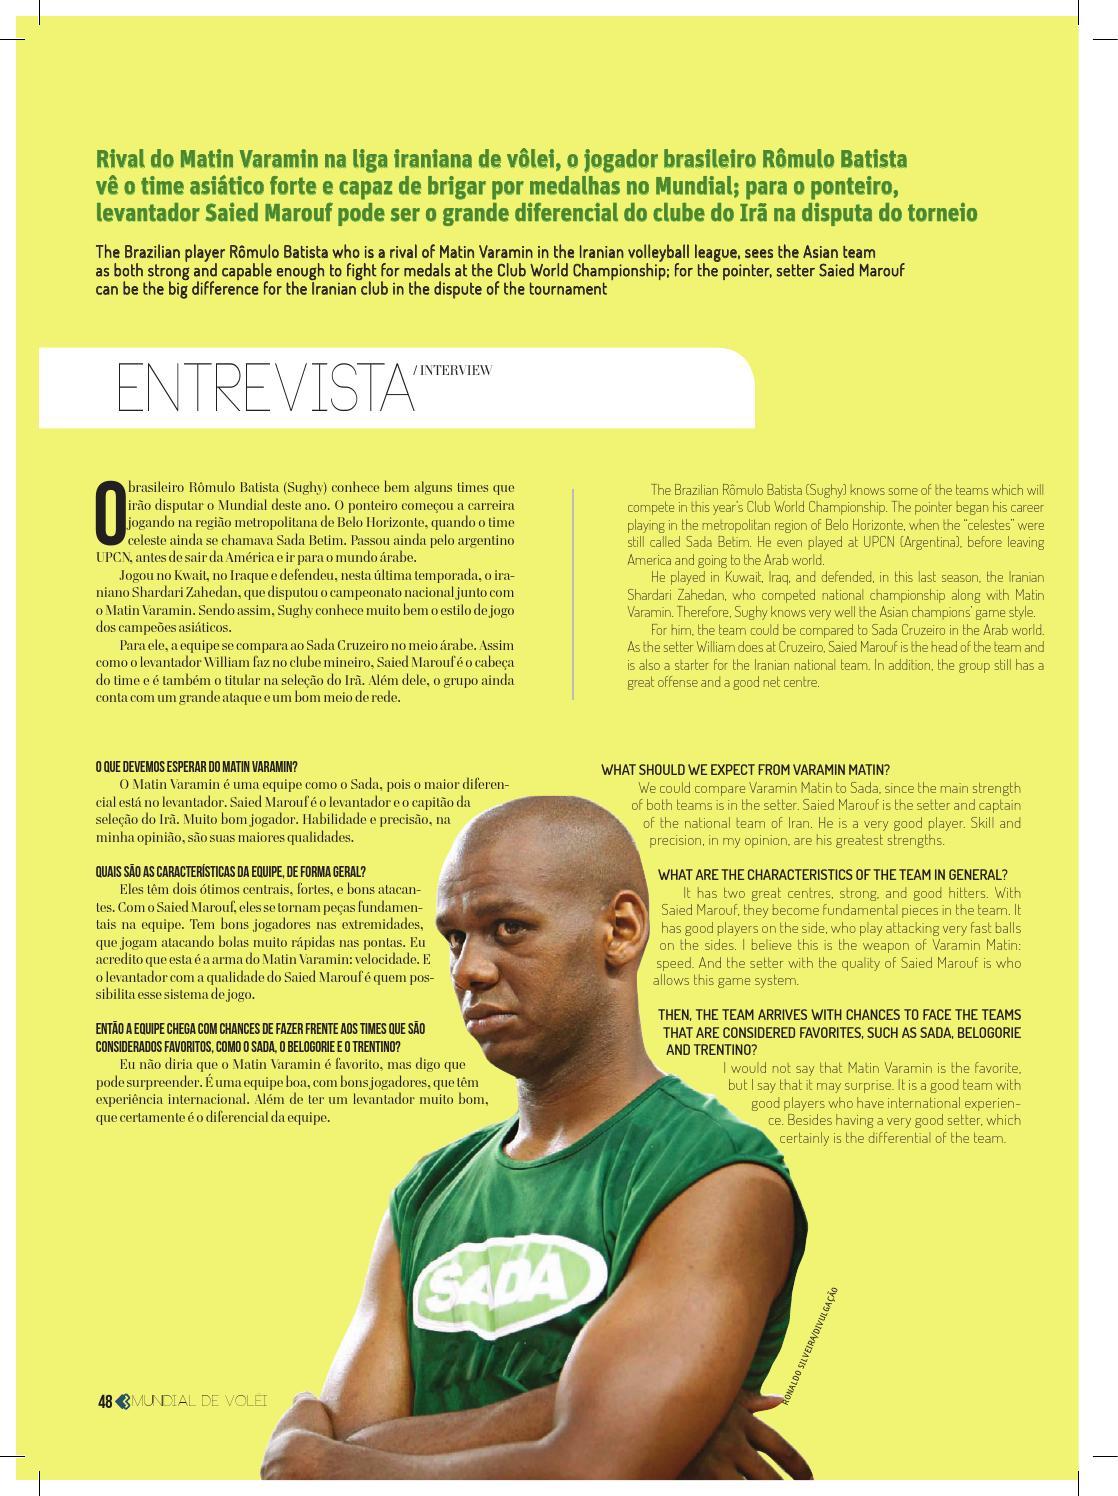 Revista Mundial de Clubes de Vôlei 2014 by Tecnologia Sempre Editora - issuu 607a191f51097